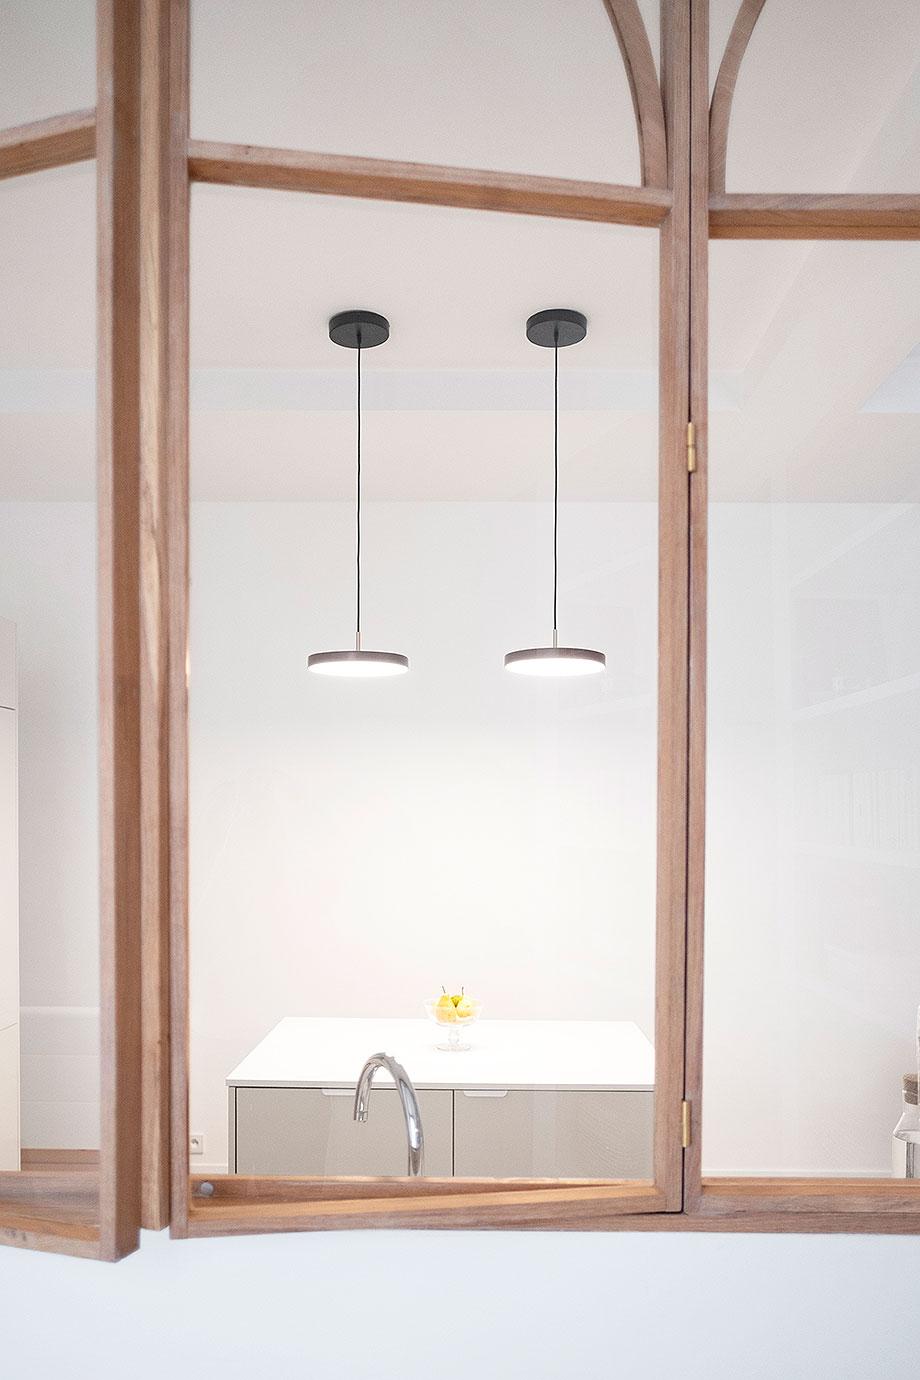 reforma integral de un apartamento en paris por anthropie architecture (s) (8) - foto juliette alexandre